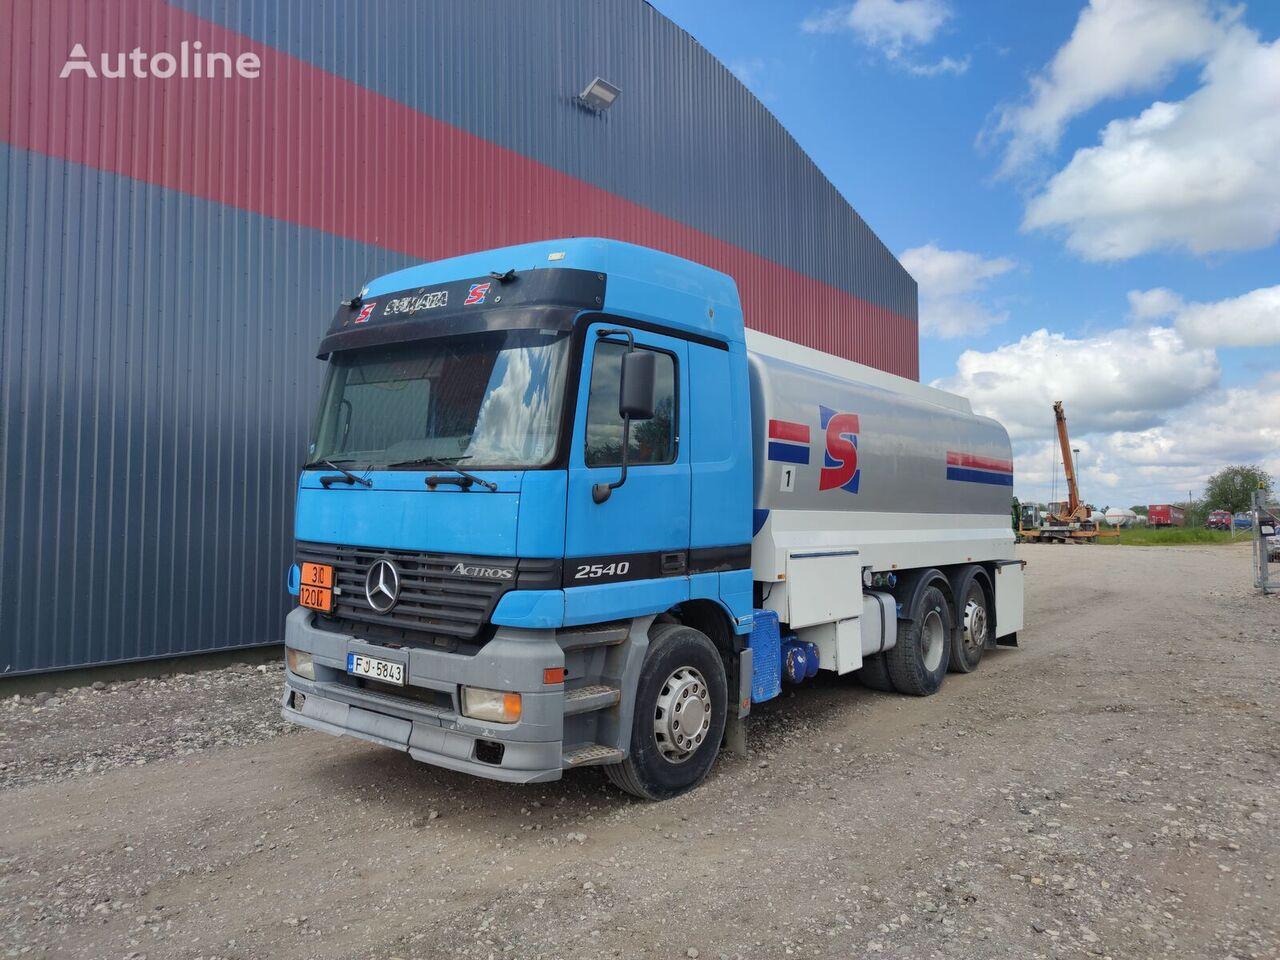 MERCEDES-BENZ 2540 camión de combustible